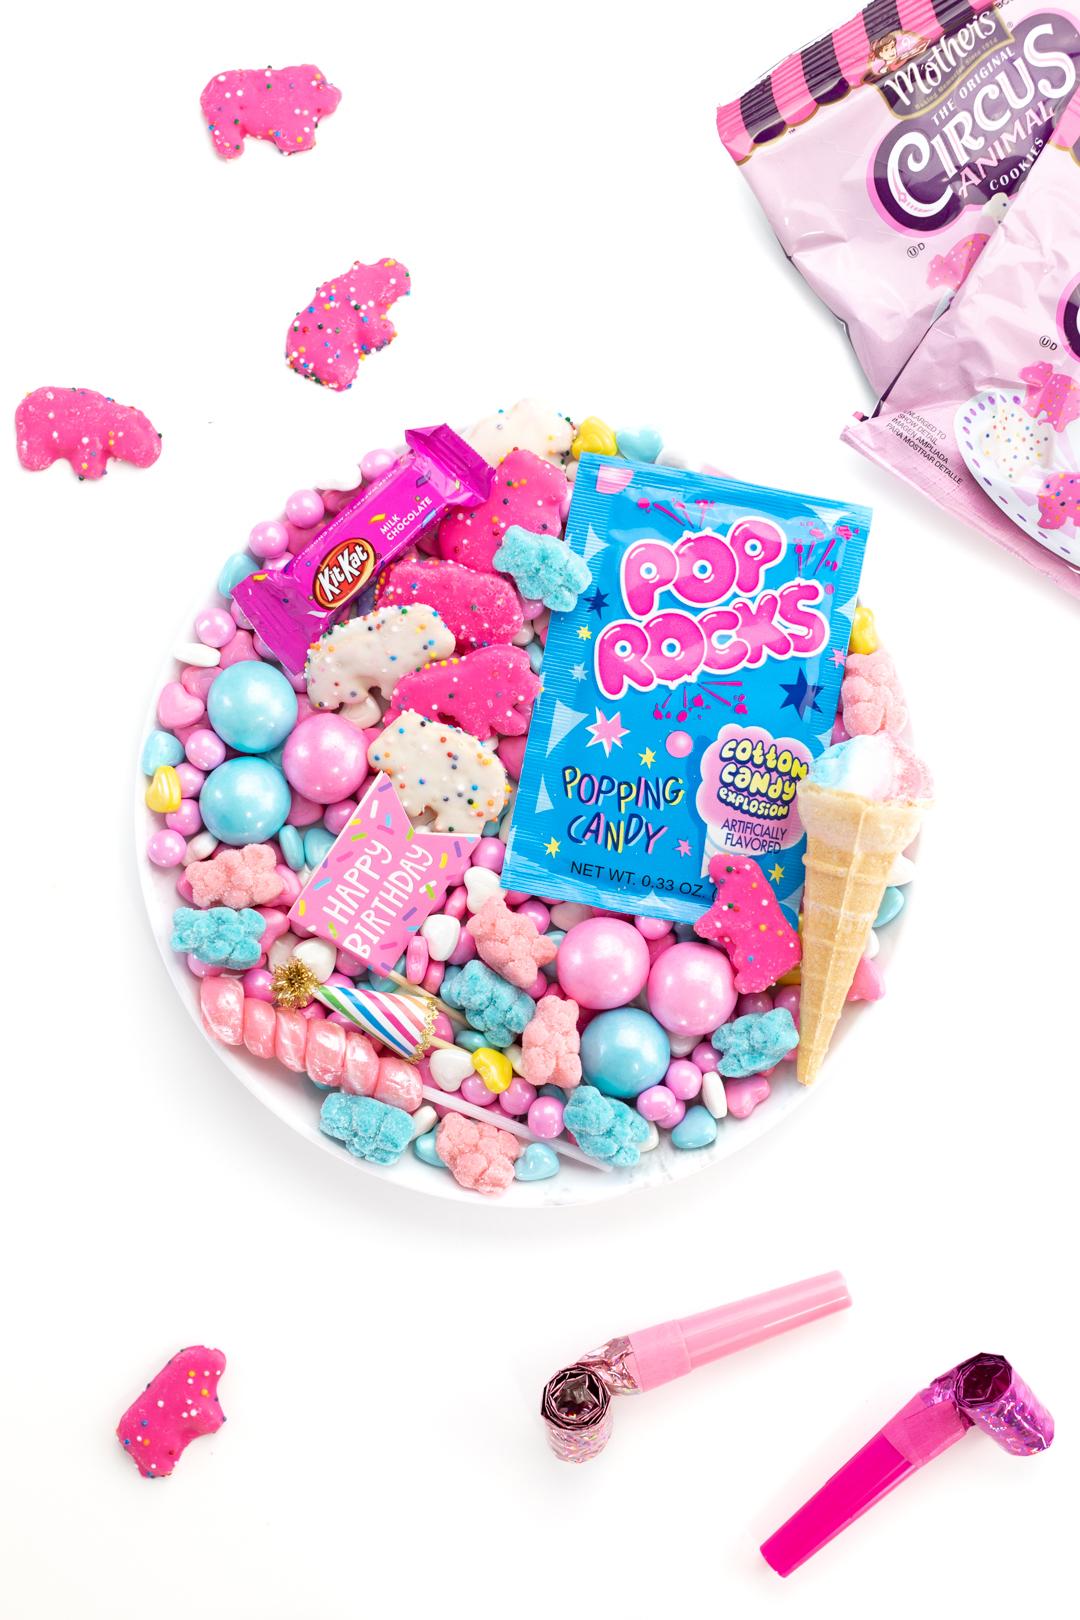 fun celebration candy charcuterie board